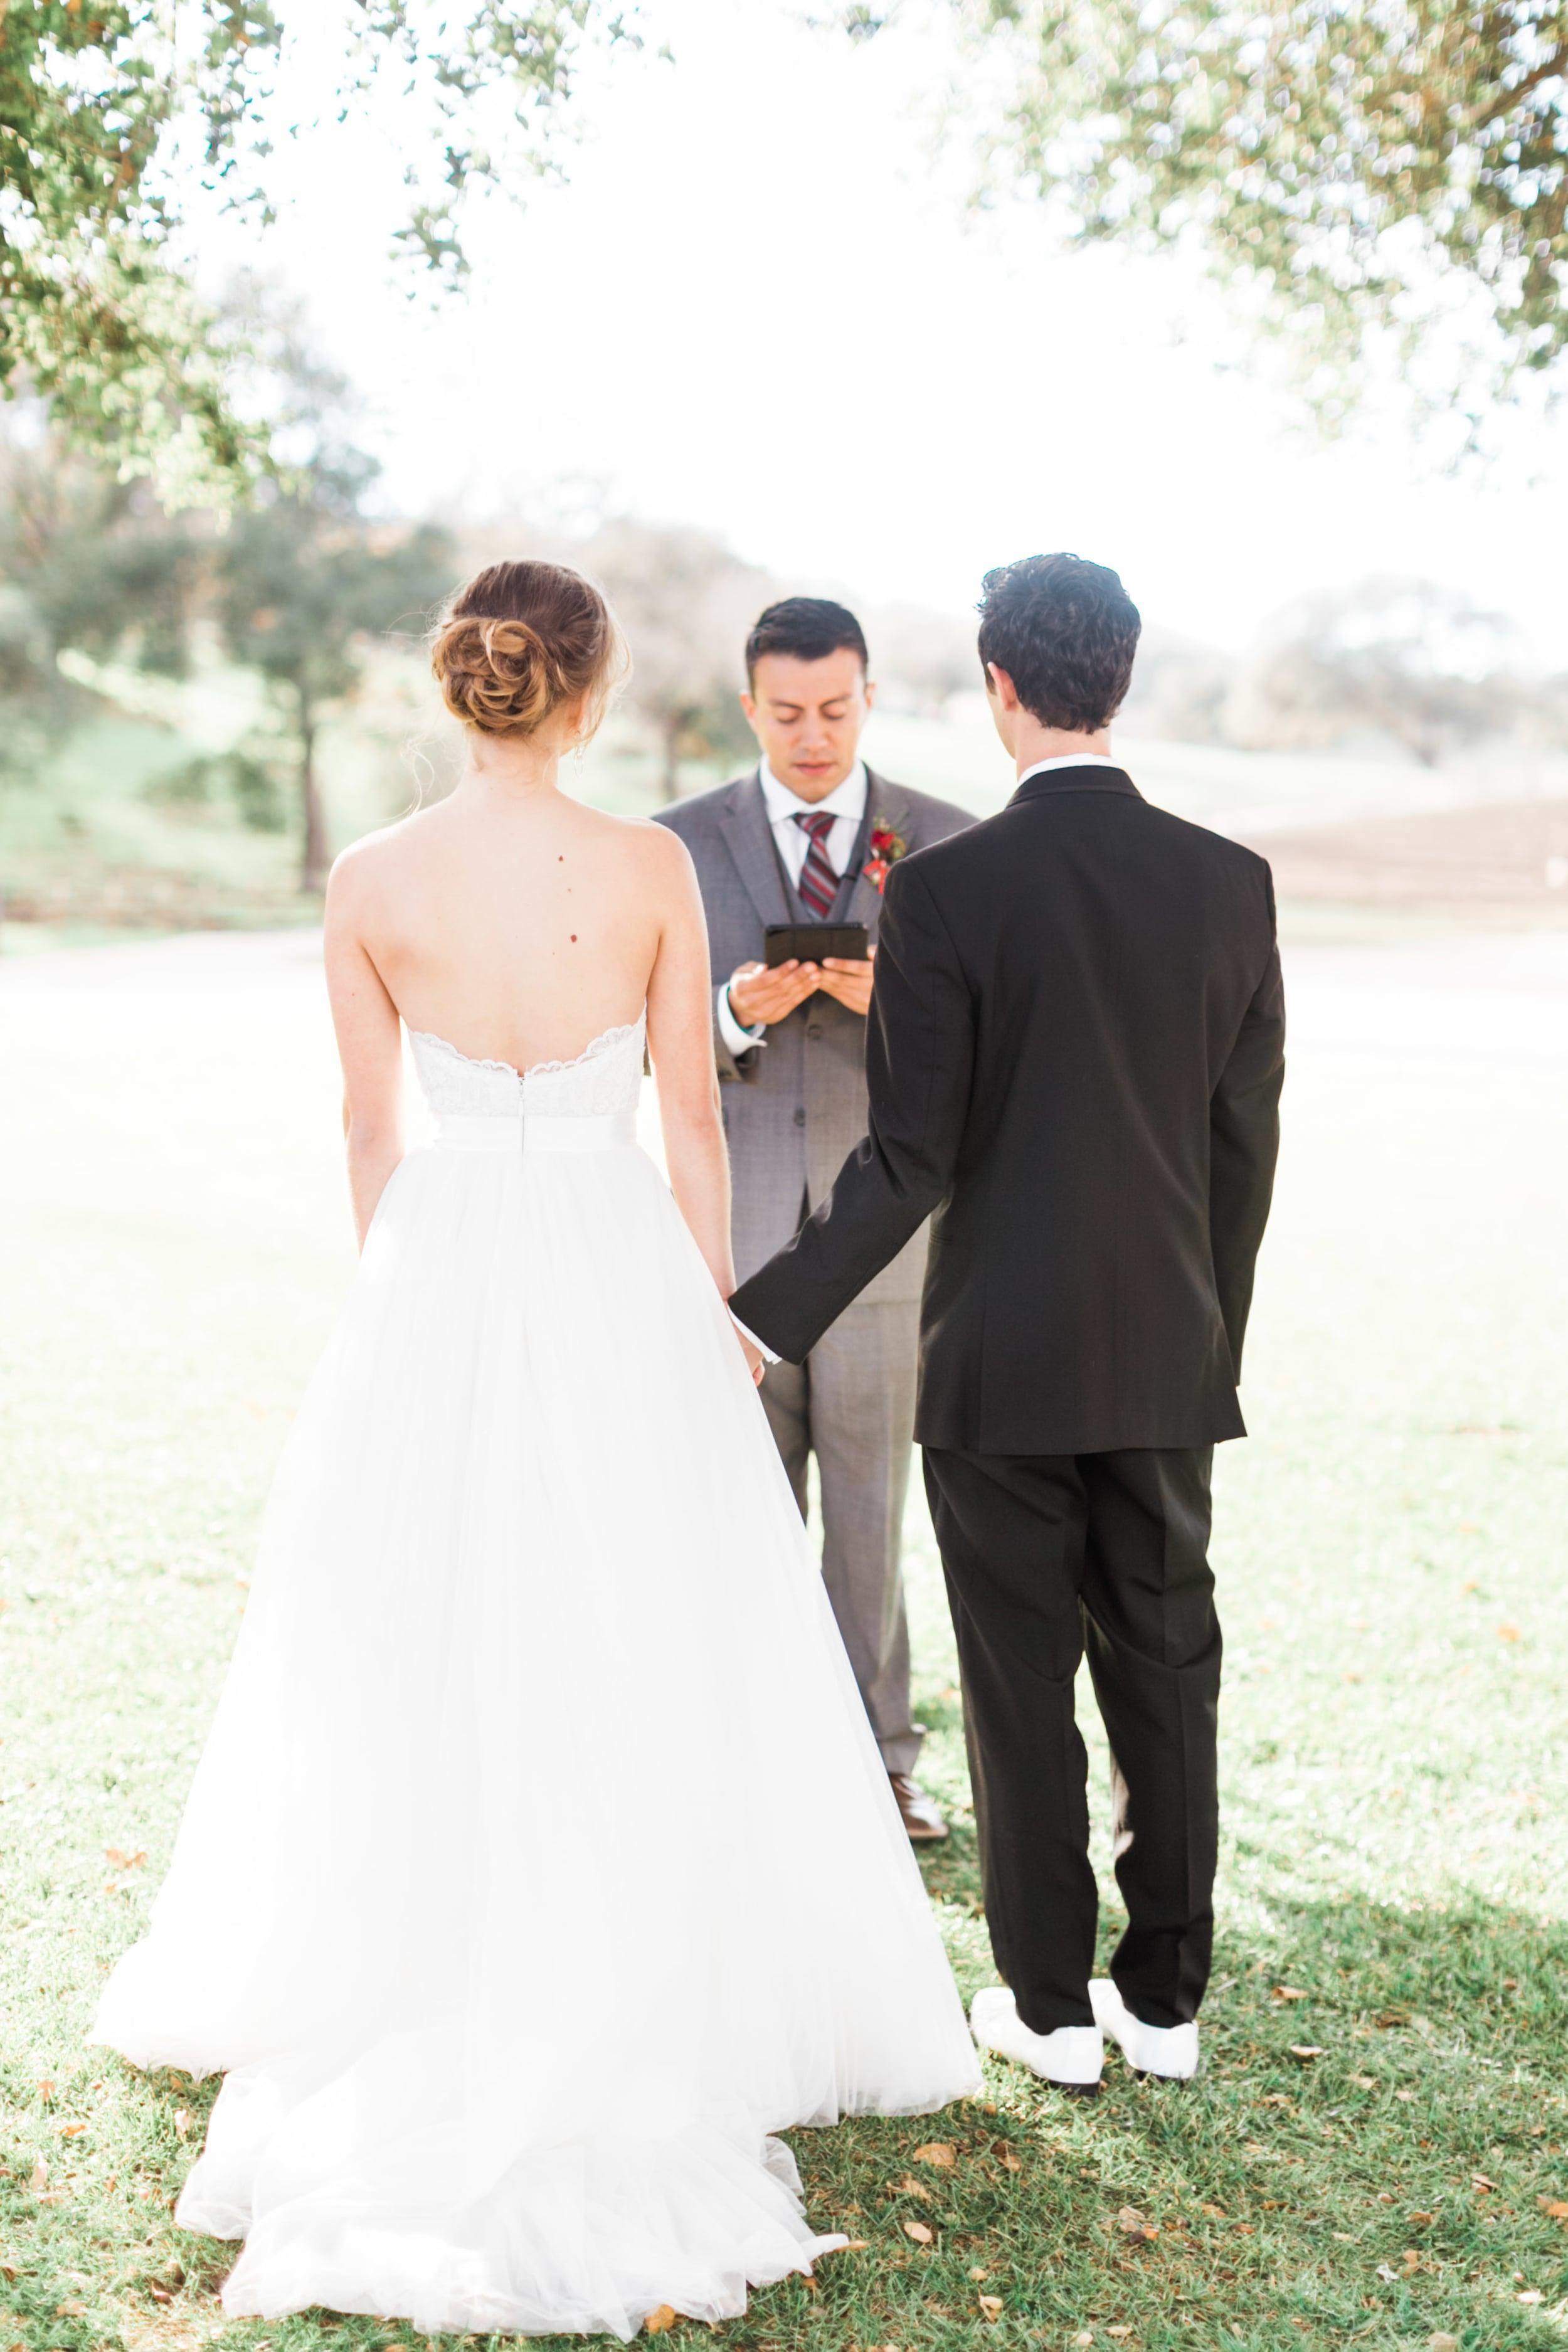 Natalie_Schutt_Photography_Winter_Wedding_San_Luis_Obispo-117.jpg